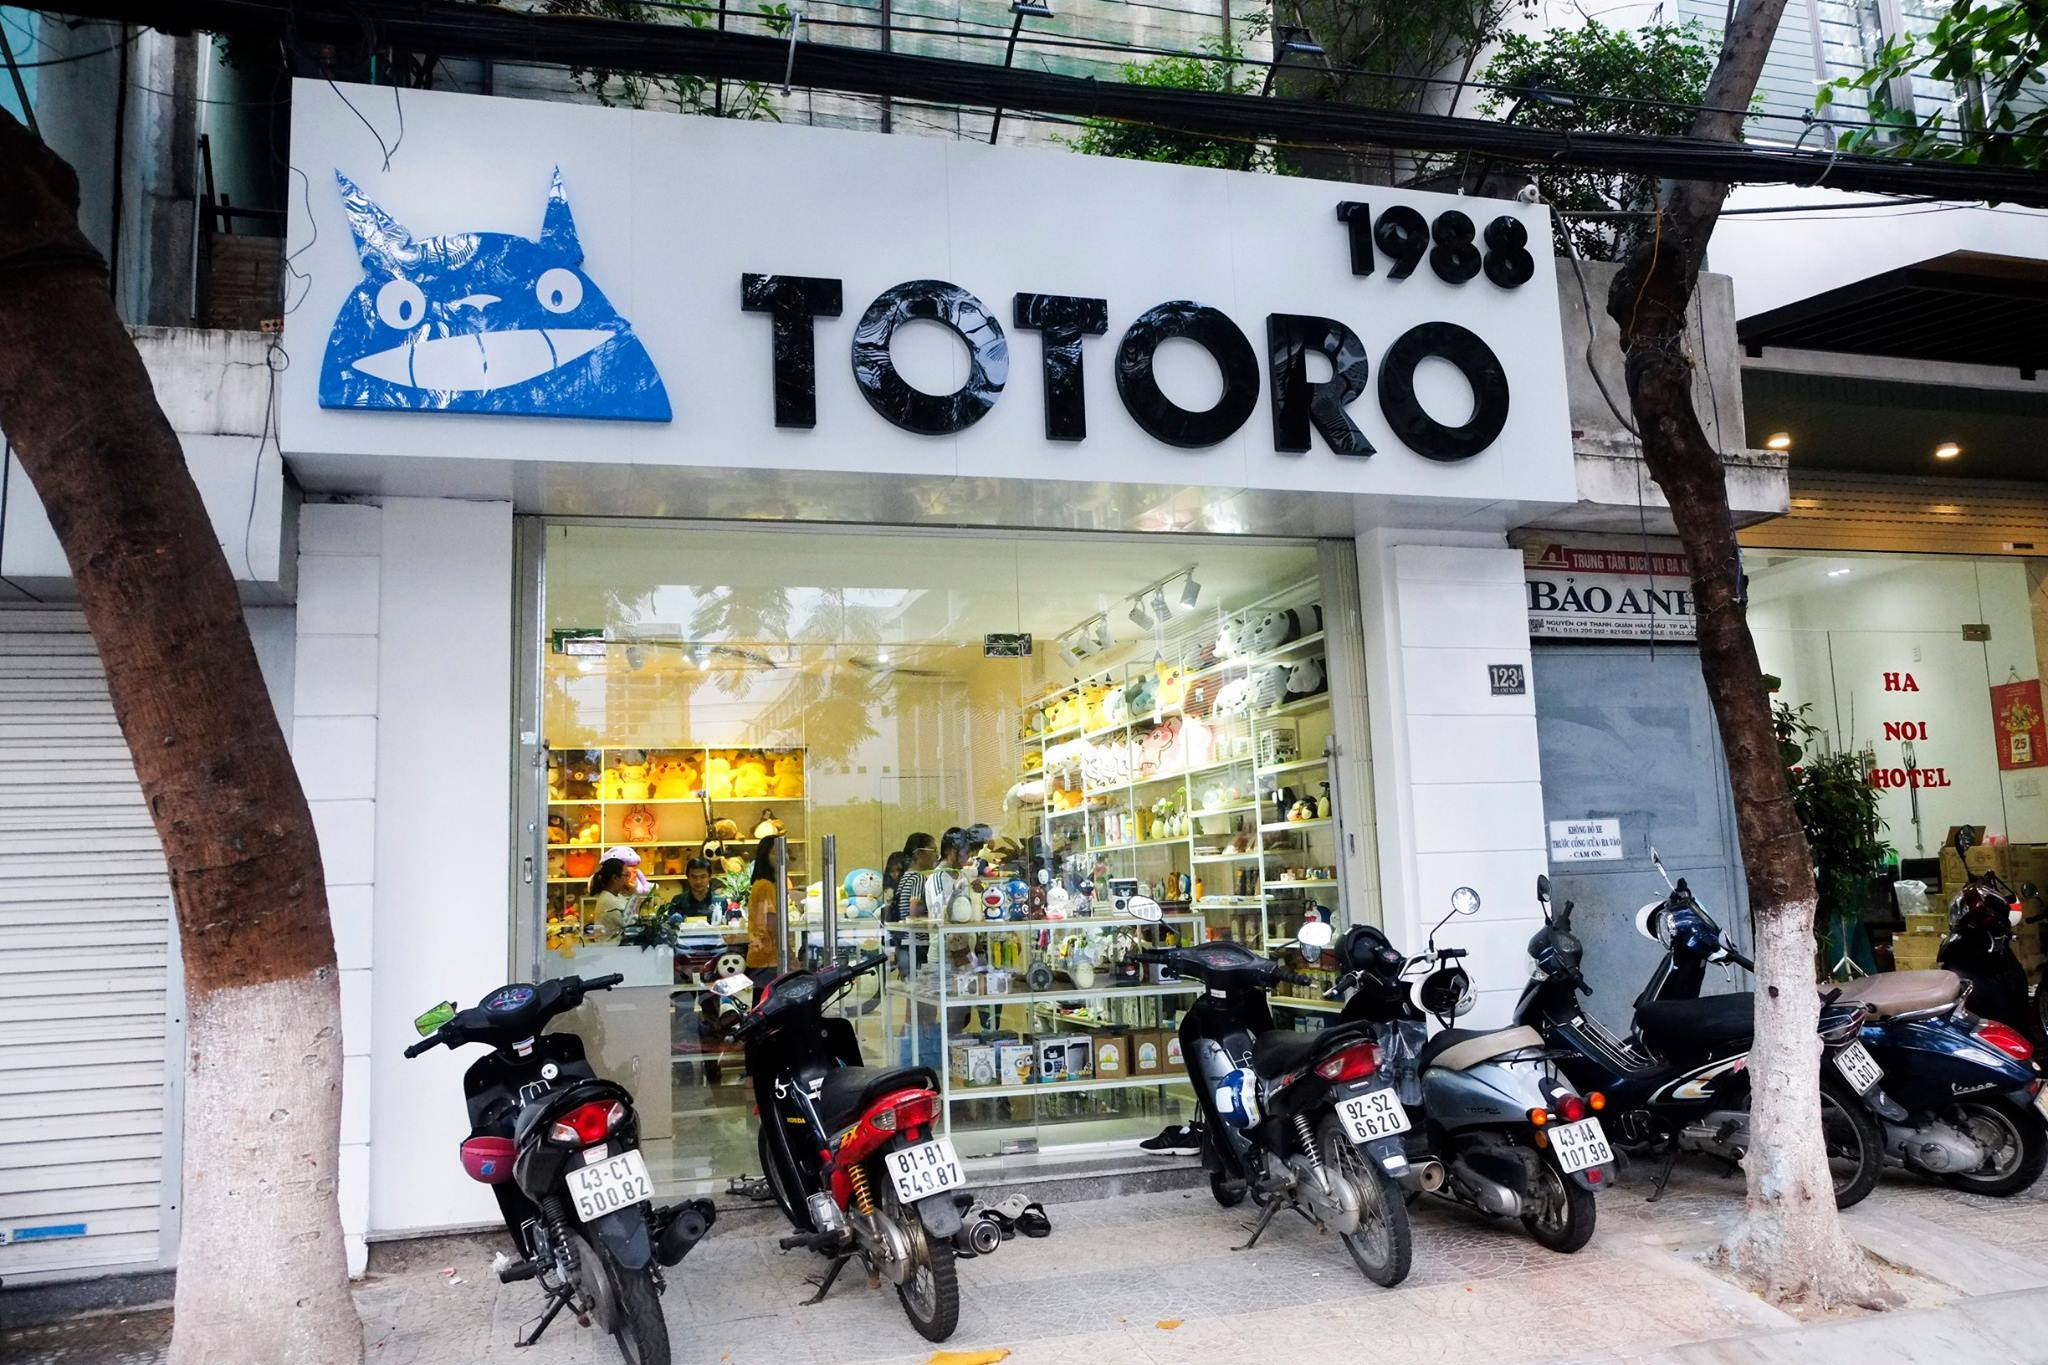 TOTORO Việt Nam